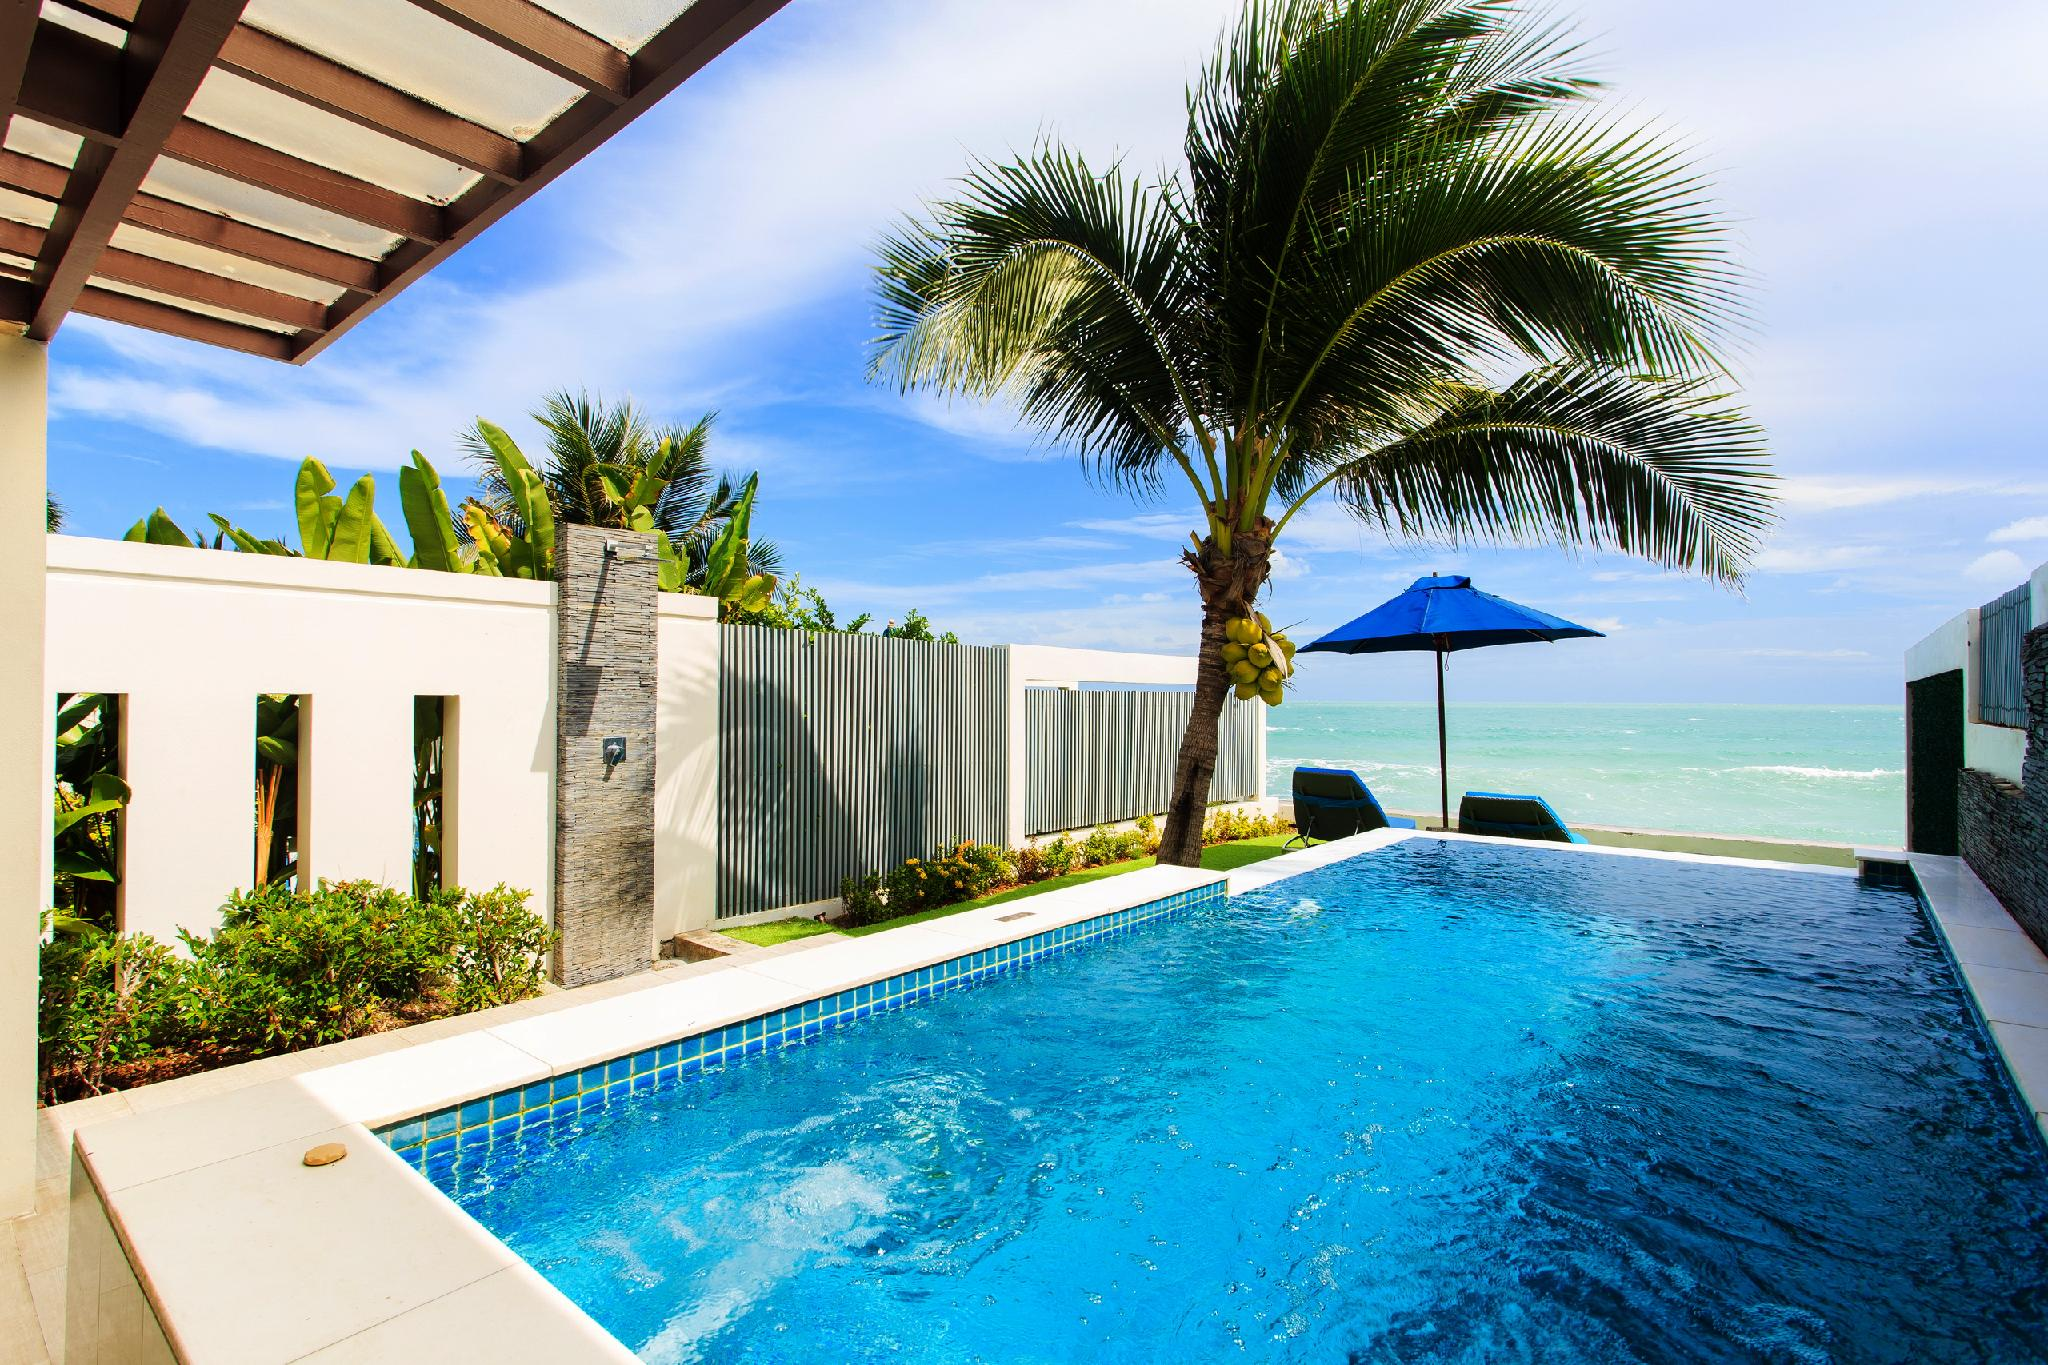 Samui Resotel Beach Resort in Koh Samui - Room Deals, Photos